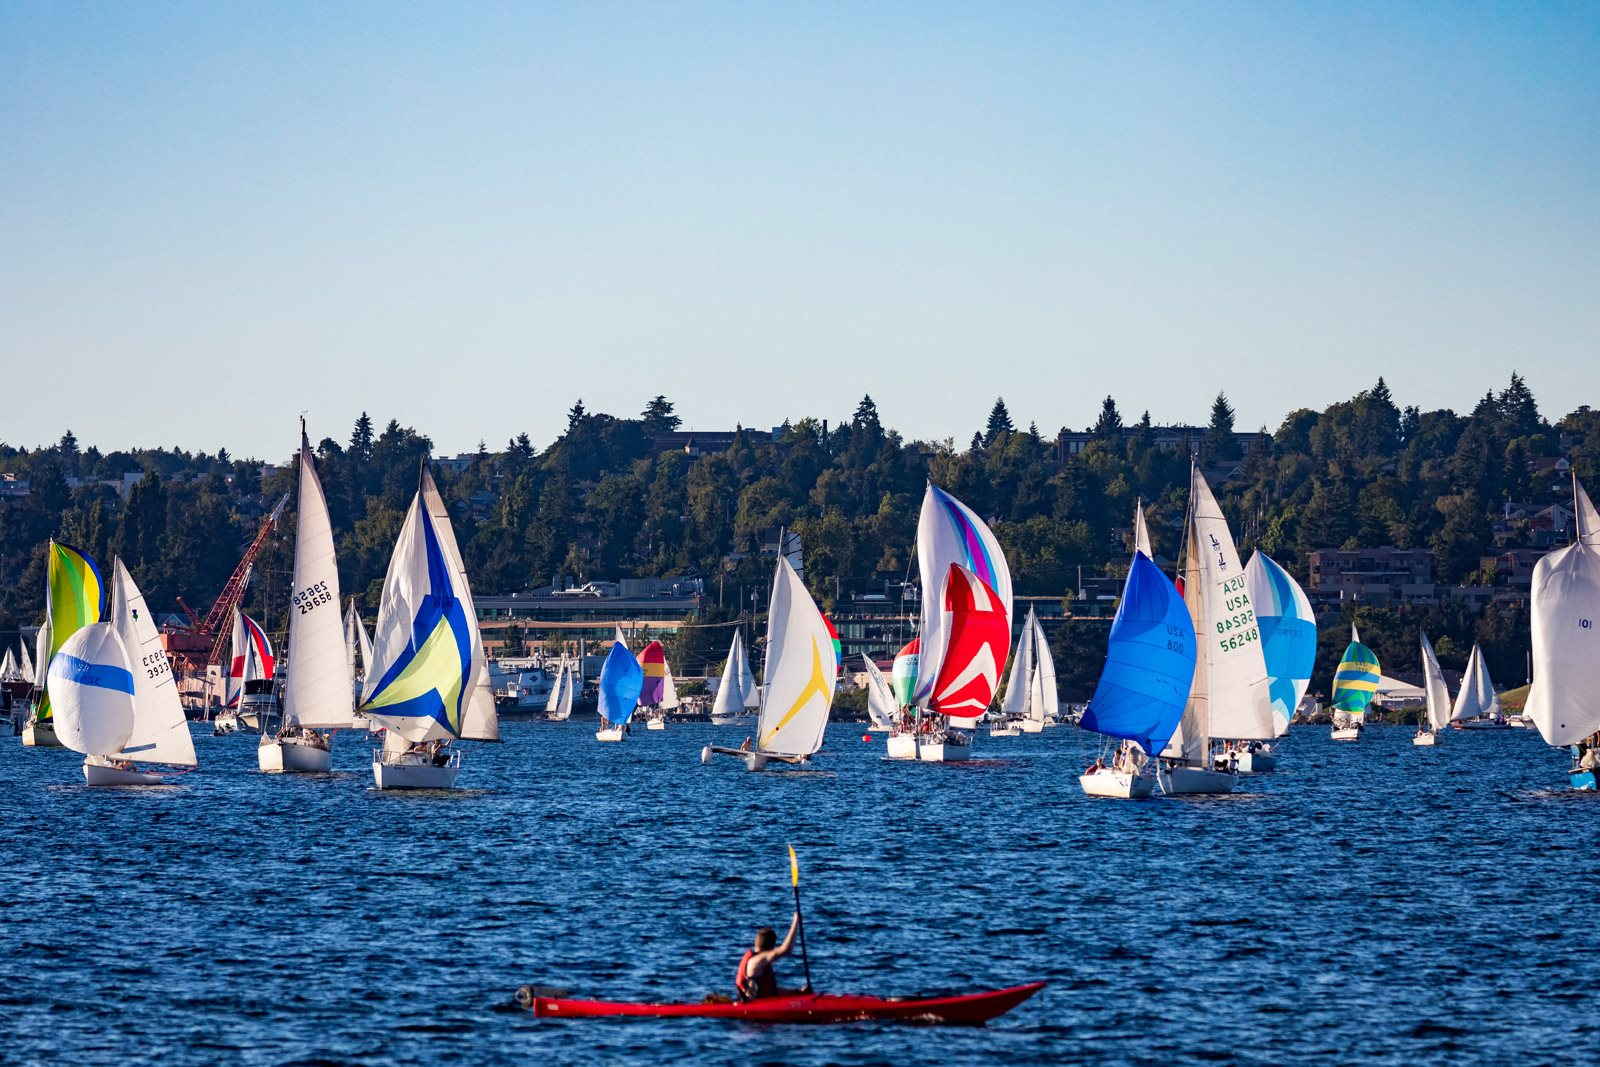 Kayaking and Sailing in South Lake Union near The Martin, Washington, 98121